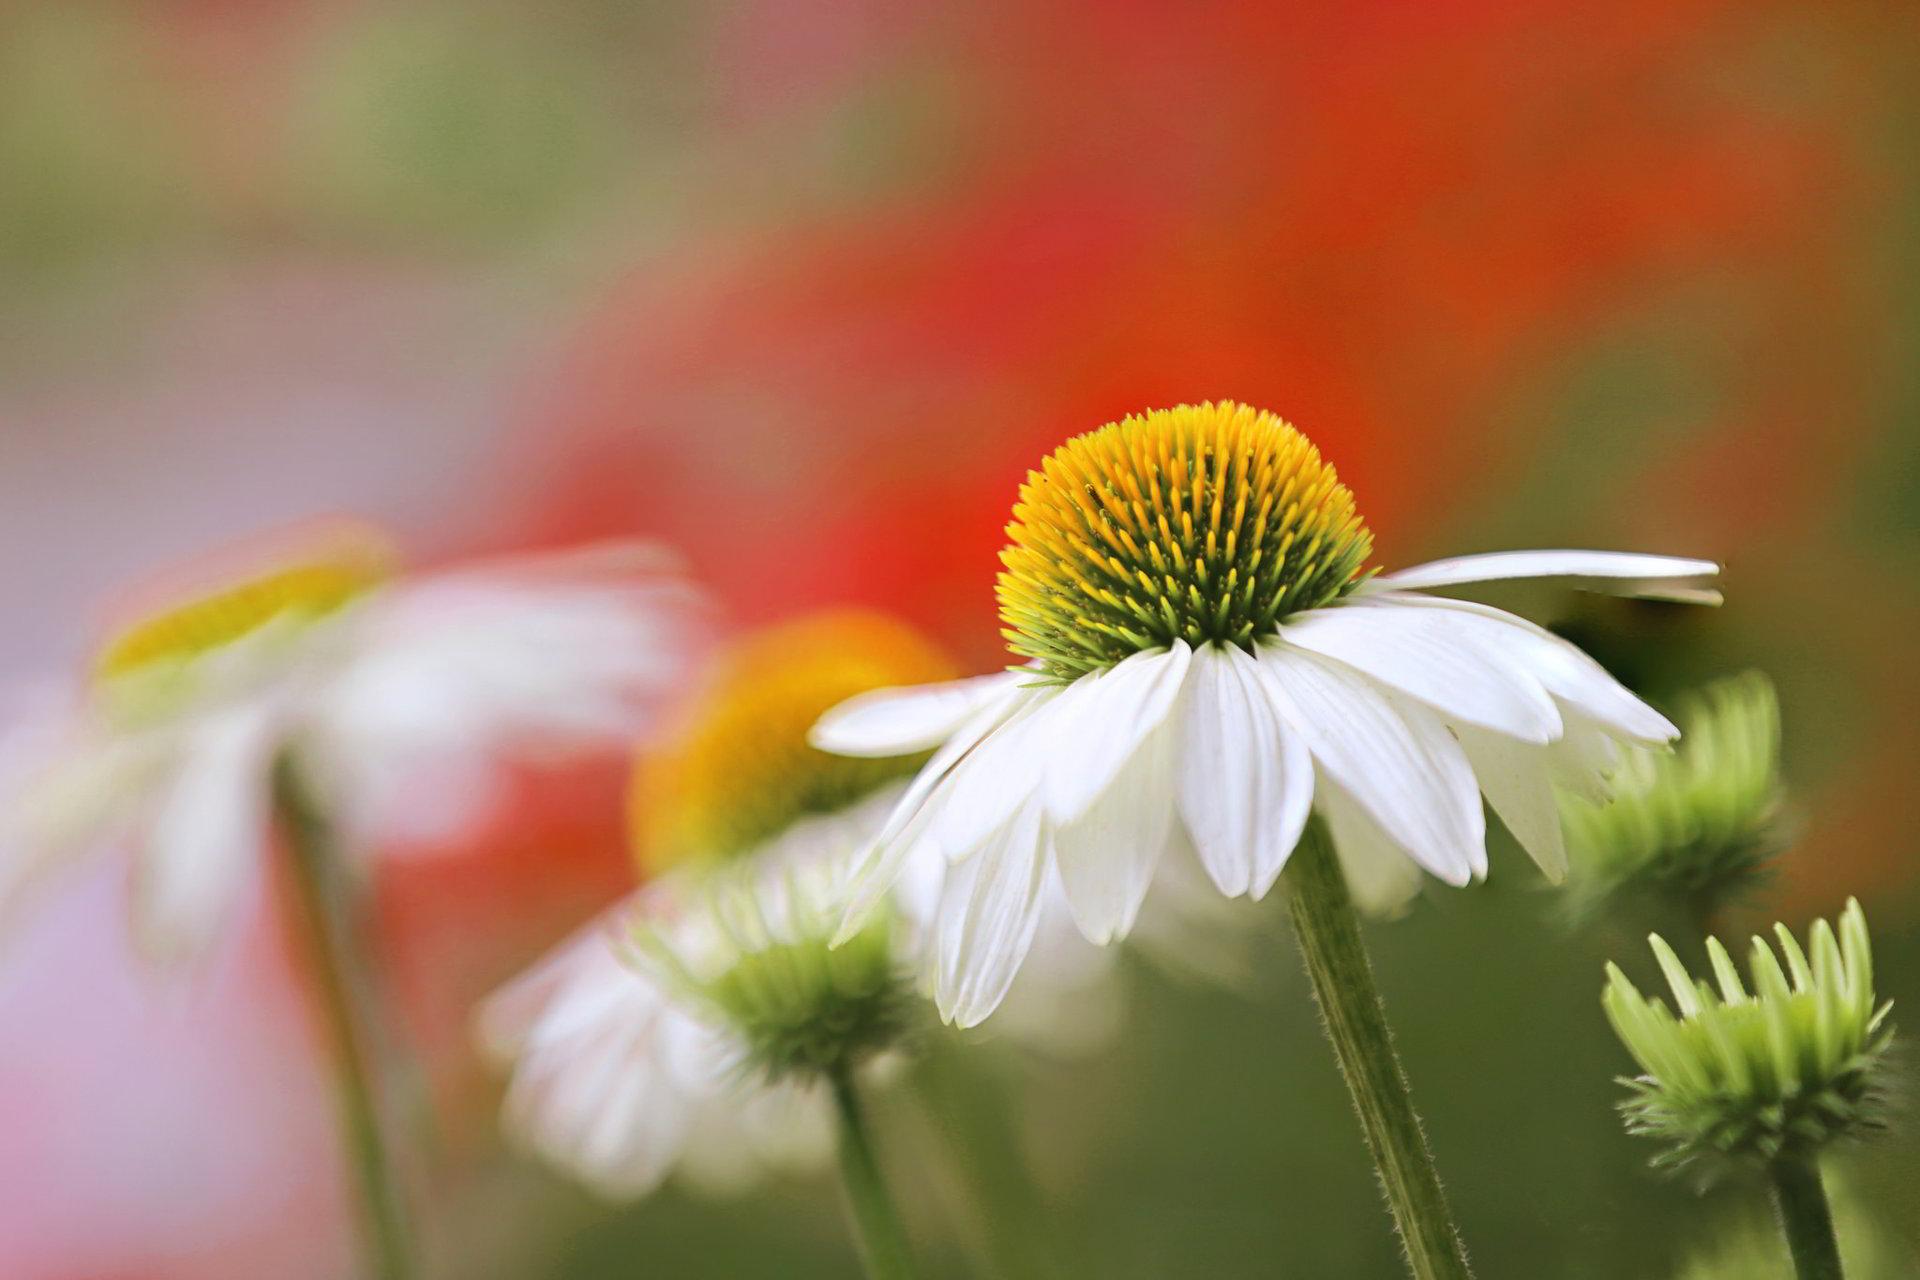 hinh anh hoa cuc dep 62